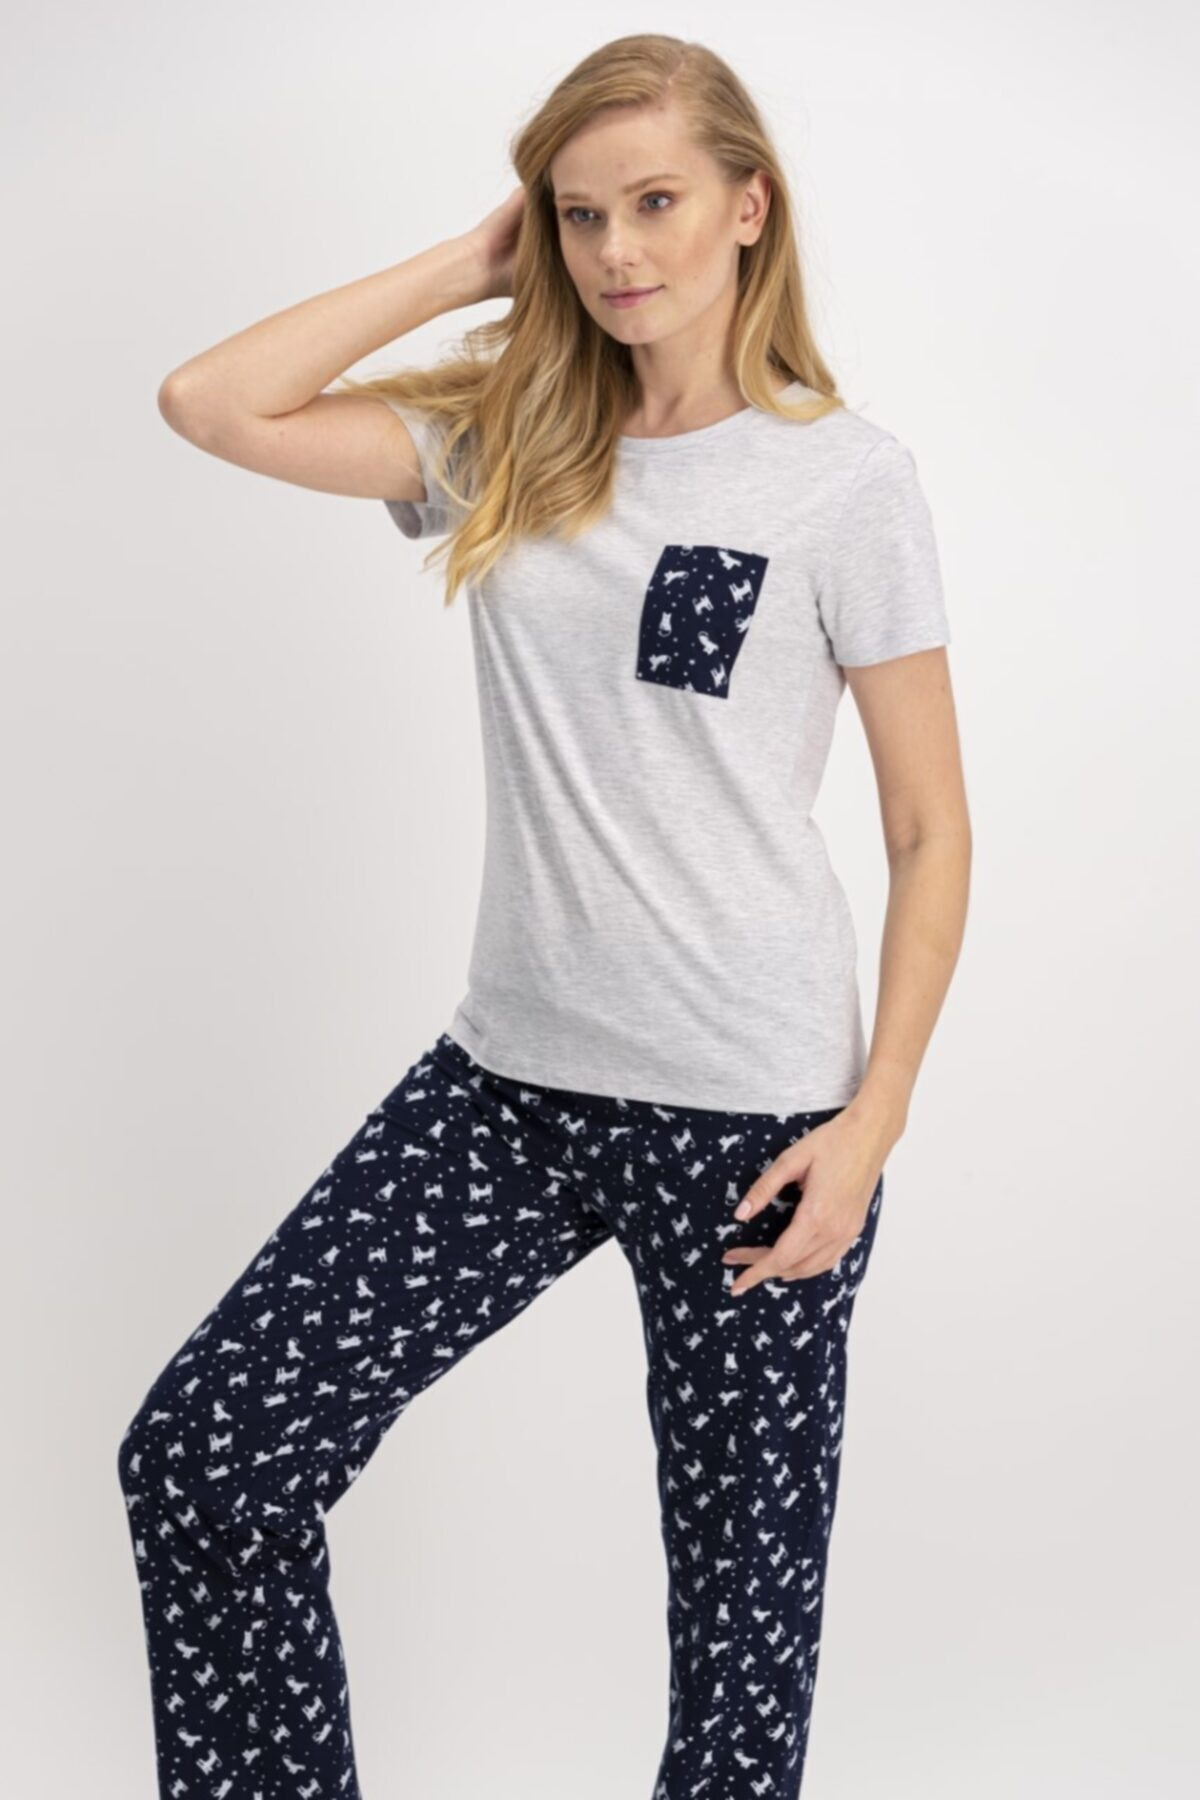 ROLY POLY Kadın Gri Kısa Kol Pijama Takımı Ar881 2